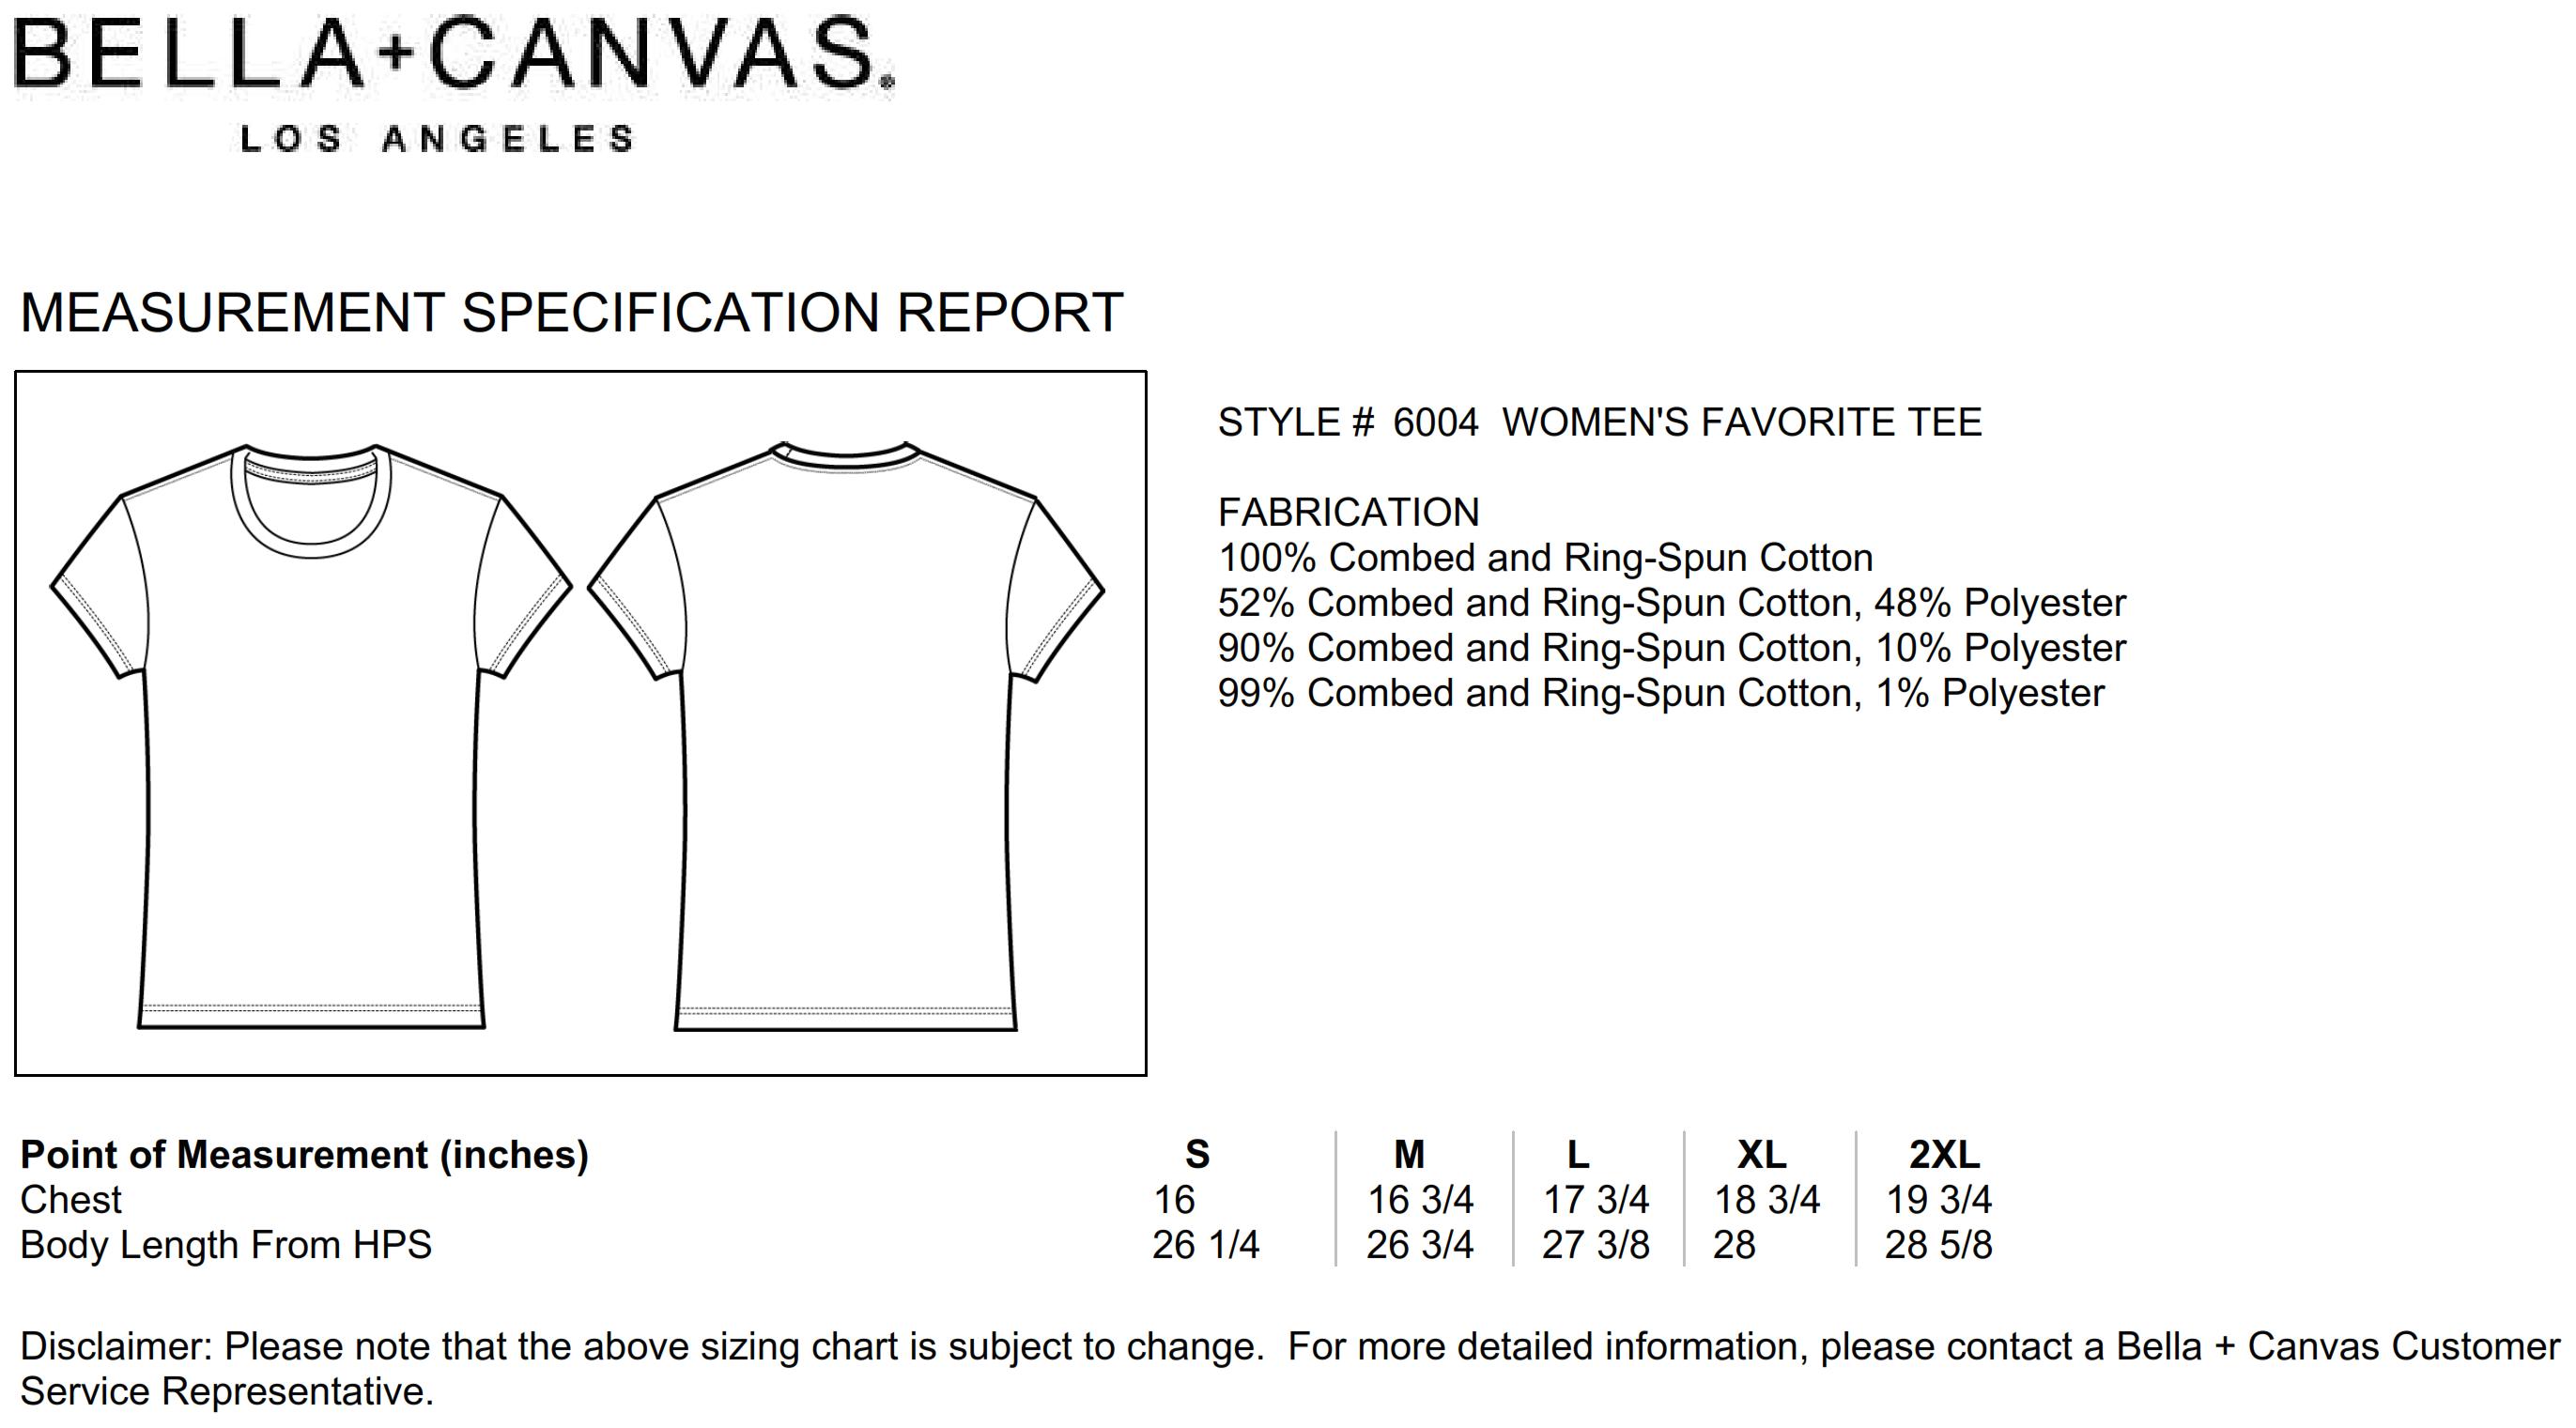 Bella+Canvas: The Favorite T-Shirt 6004